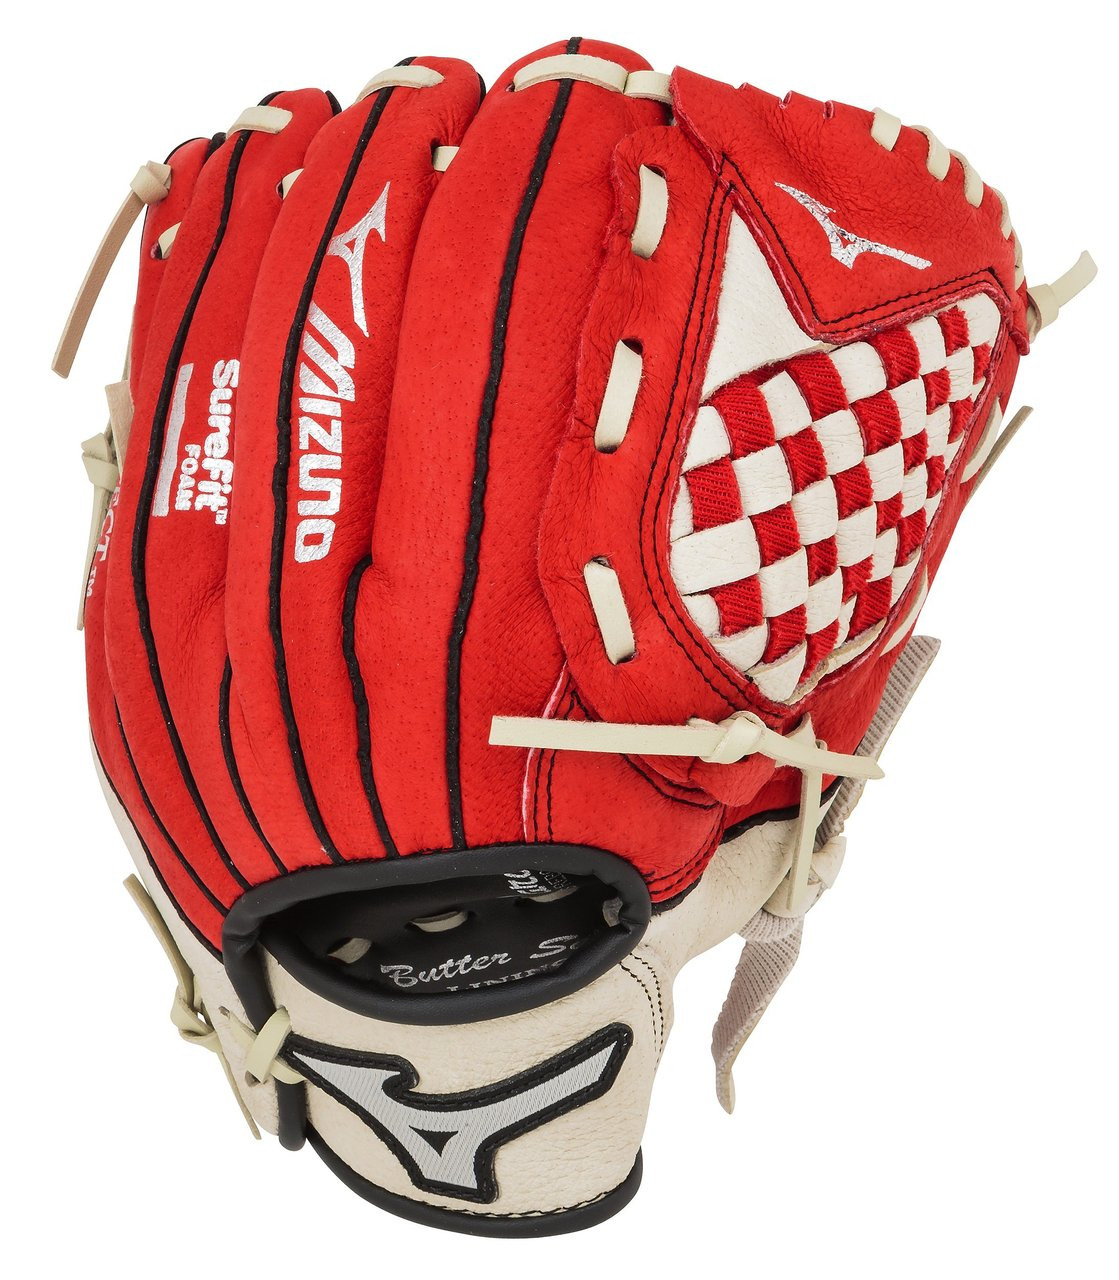 Mizuno Prospect Series GPP1000Y1RD 10 inch Red Youth Baseball ... c7dc19b9567a